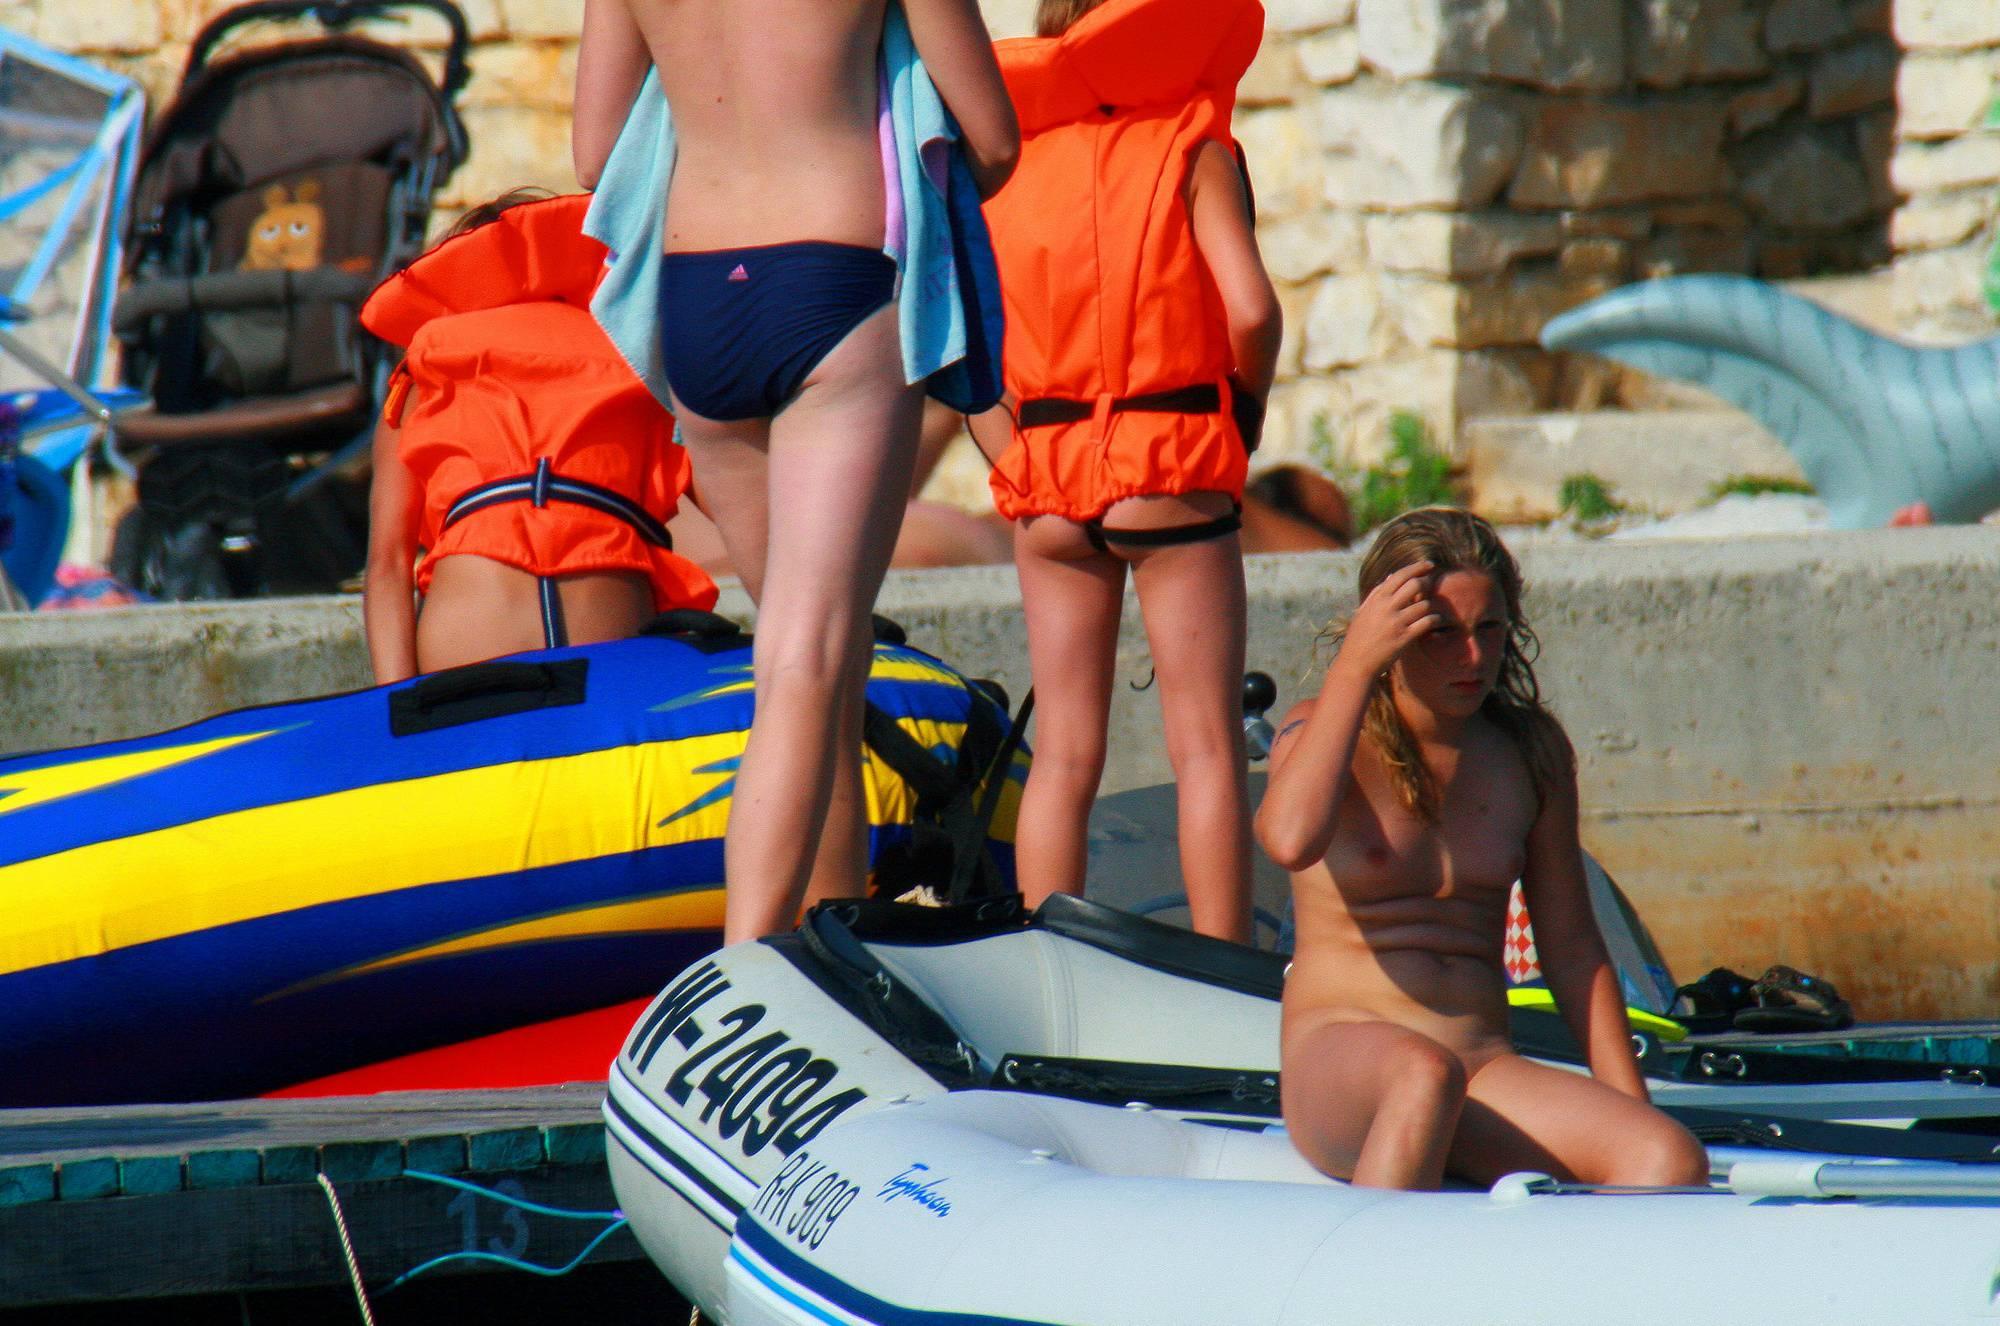 Pure Nudism-Ula FKK Boating Family - 1